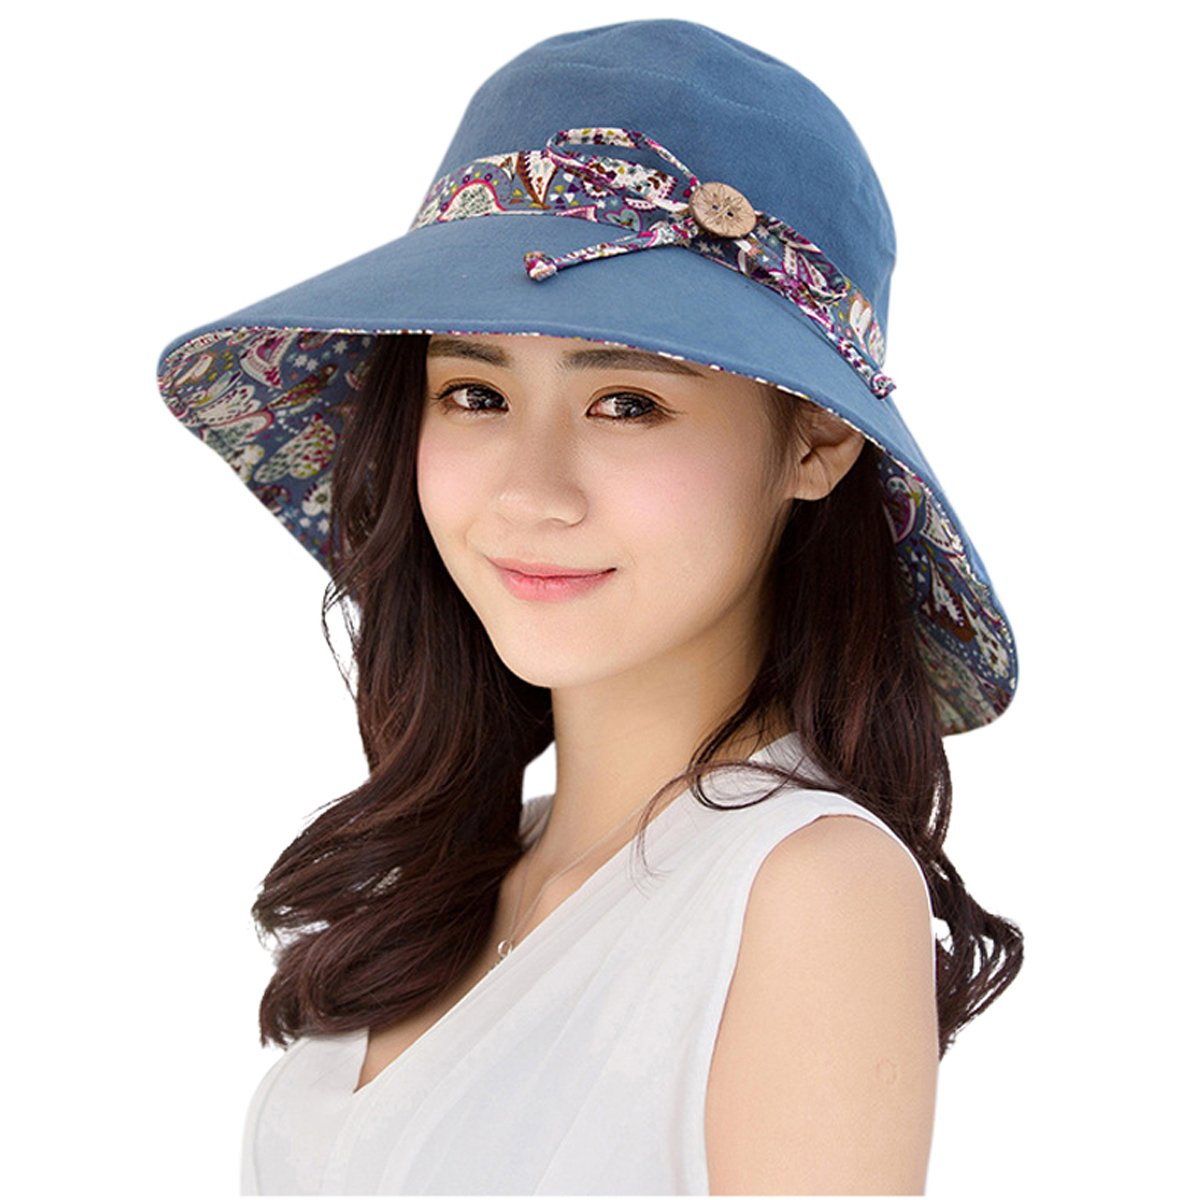 HindaWi Womens Sun Hat Summer Reversible UPF 50+ Beach Hat Foldable Wide Brim Cap, Blue